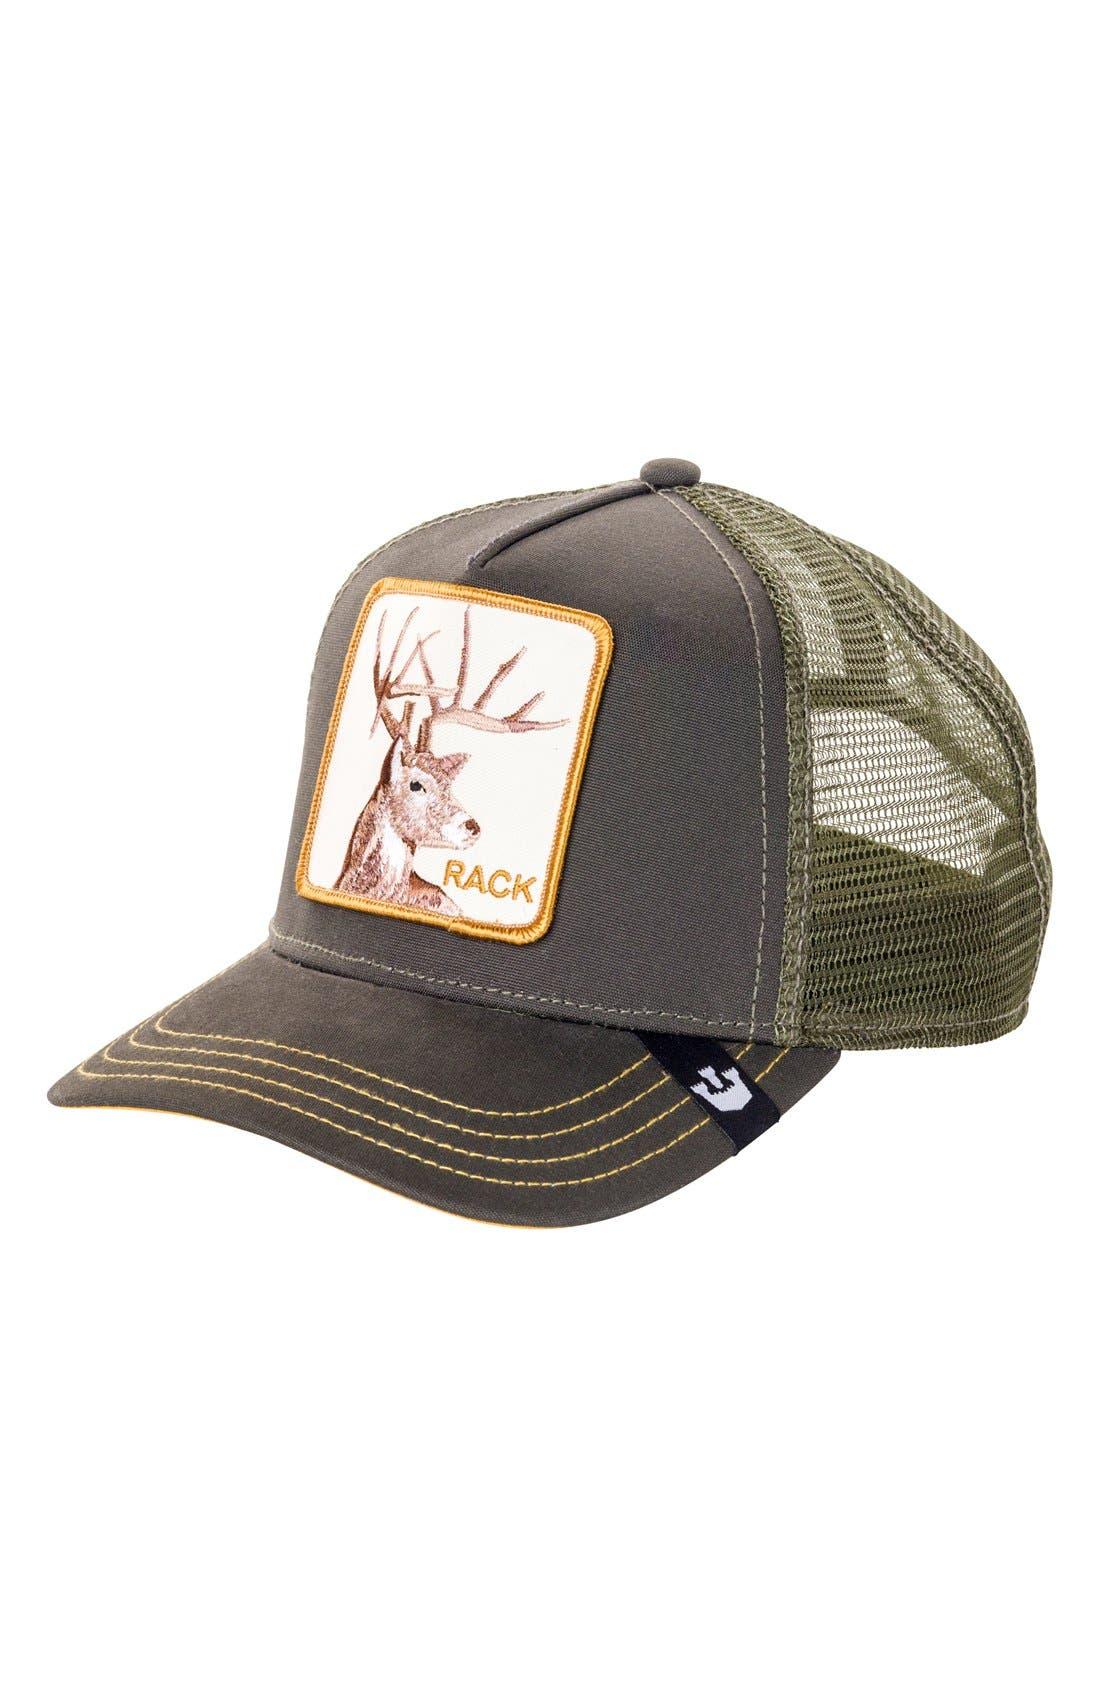 'Animal Farm - Rack' Trucker Hat,                         Main,                         color, OLIVE